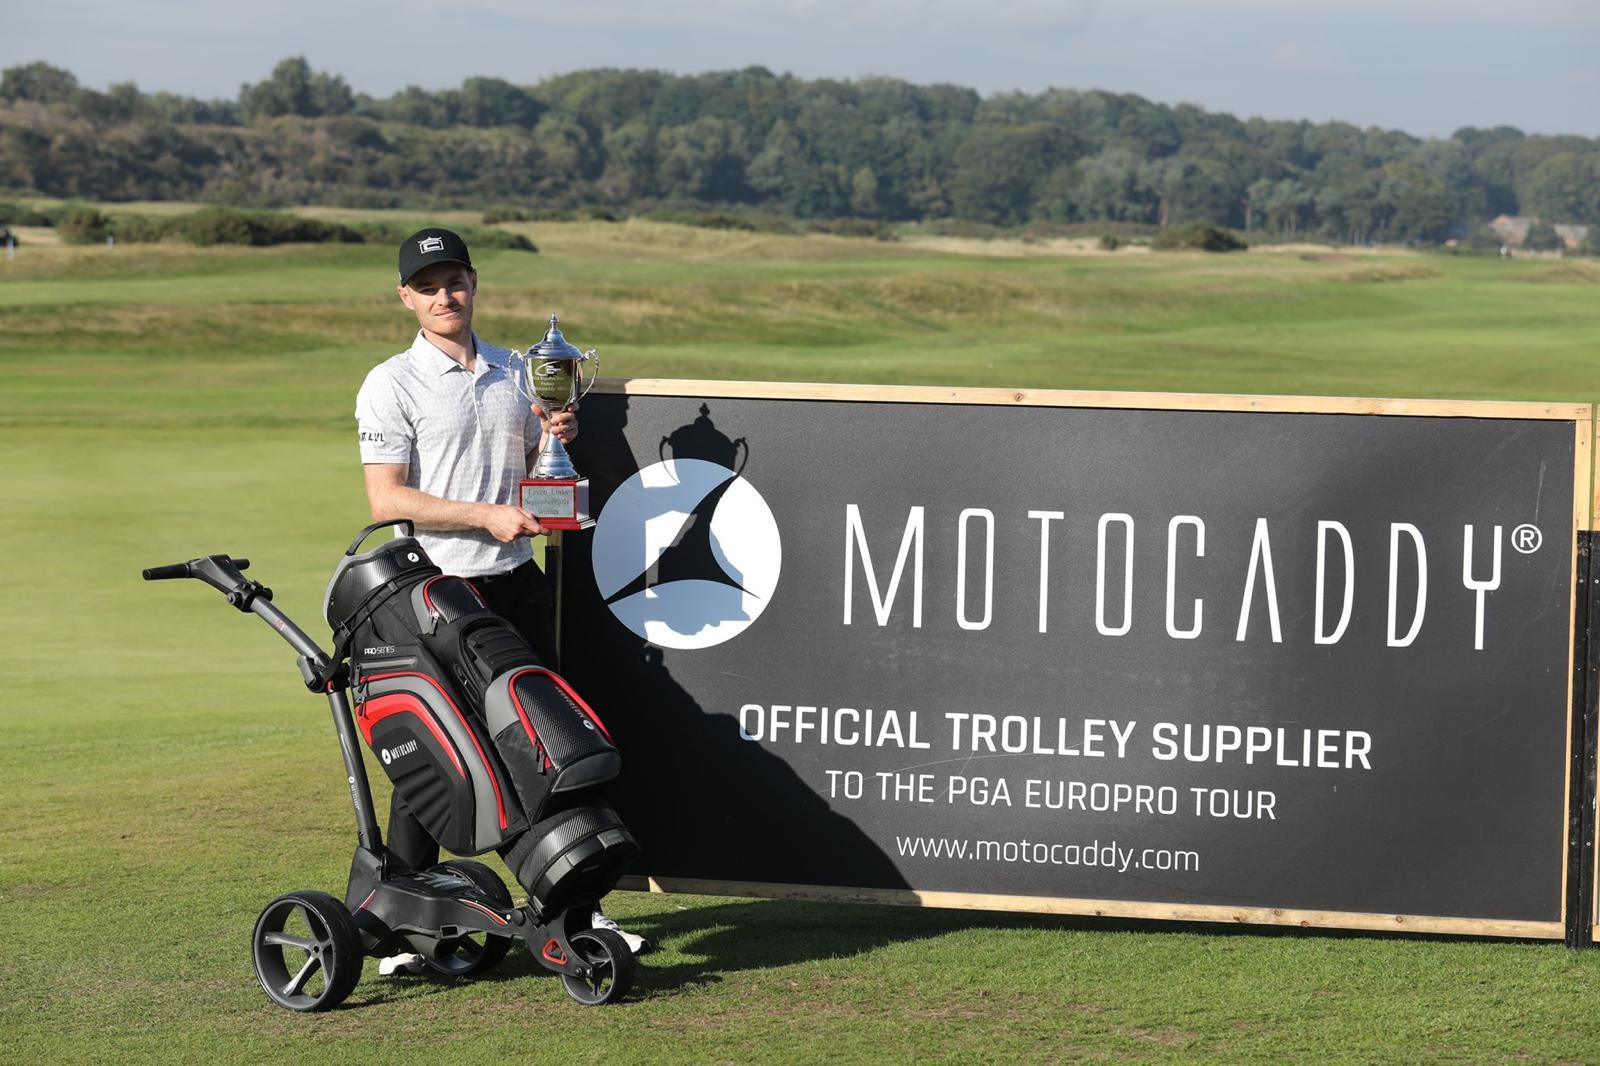 Jack South shoots 59 to claim Motocaddy Masters title and £59k bonus